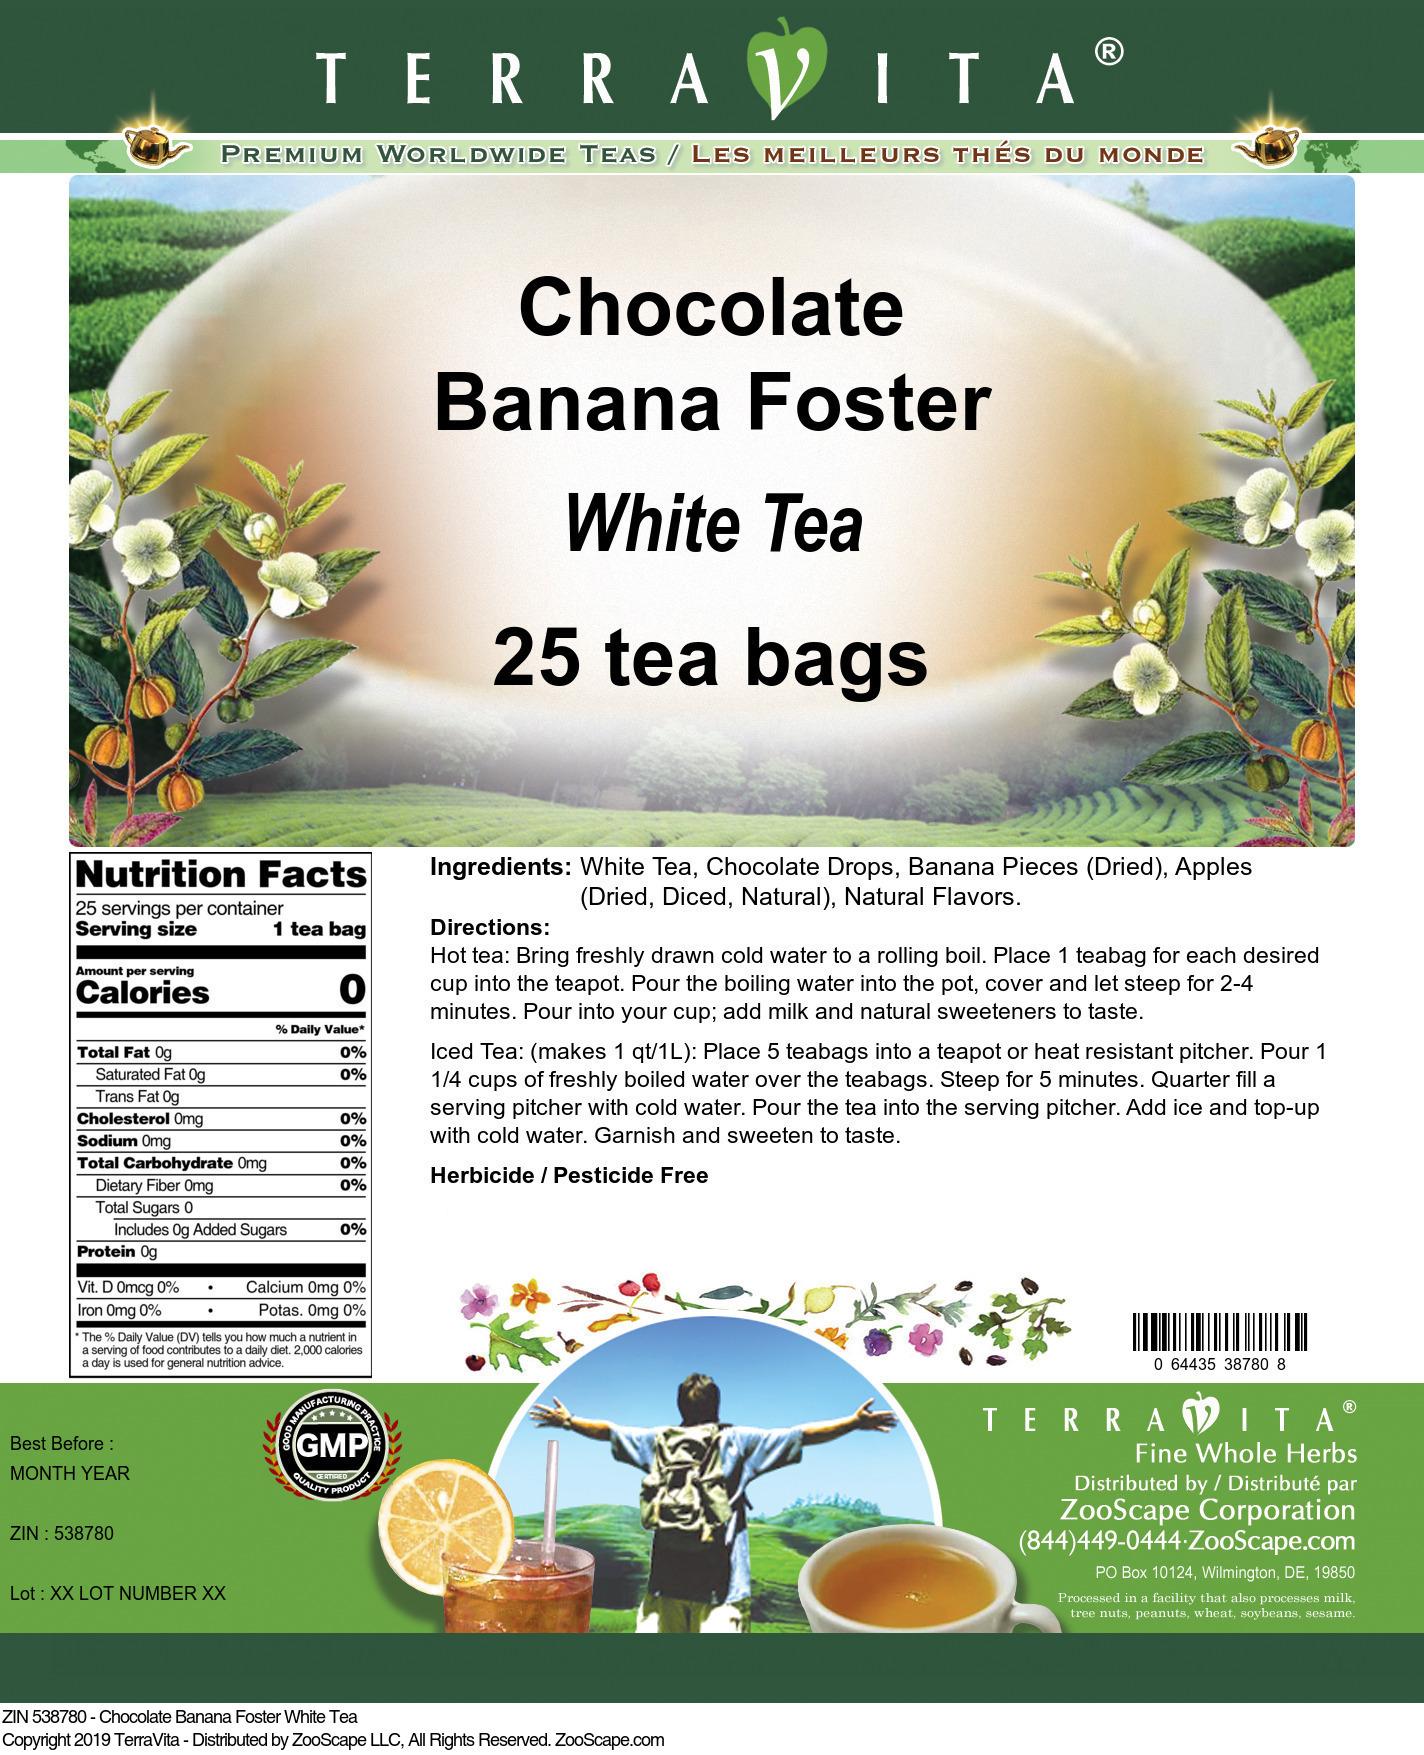 Chocolate Banana Foster White Tea